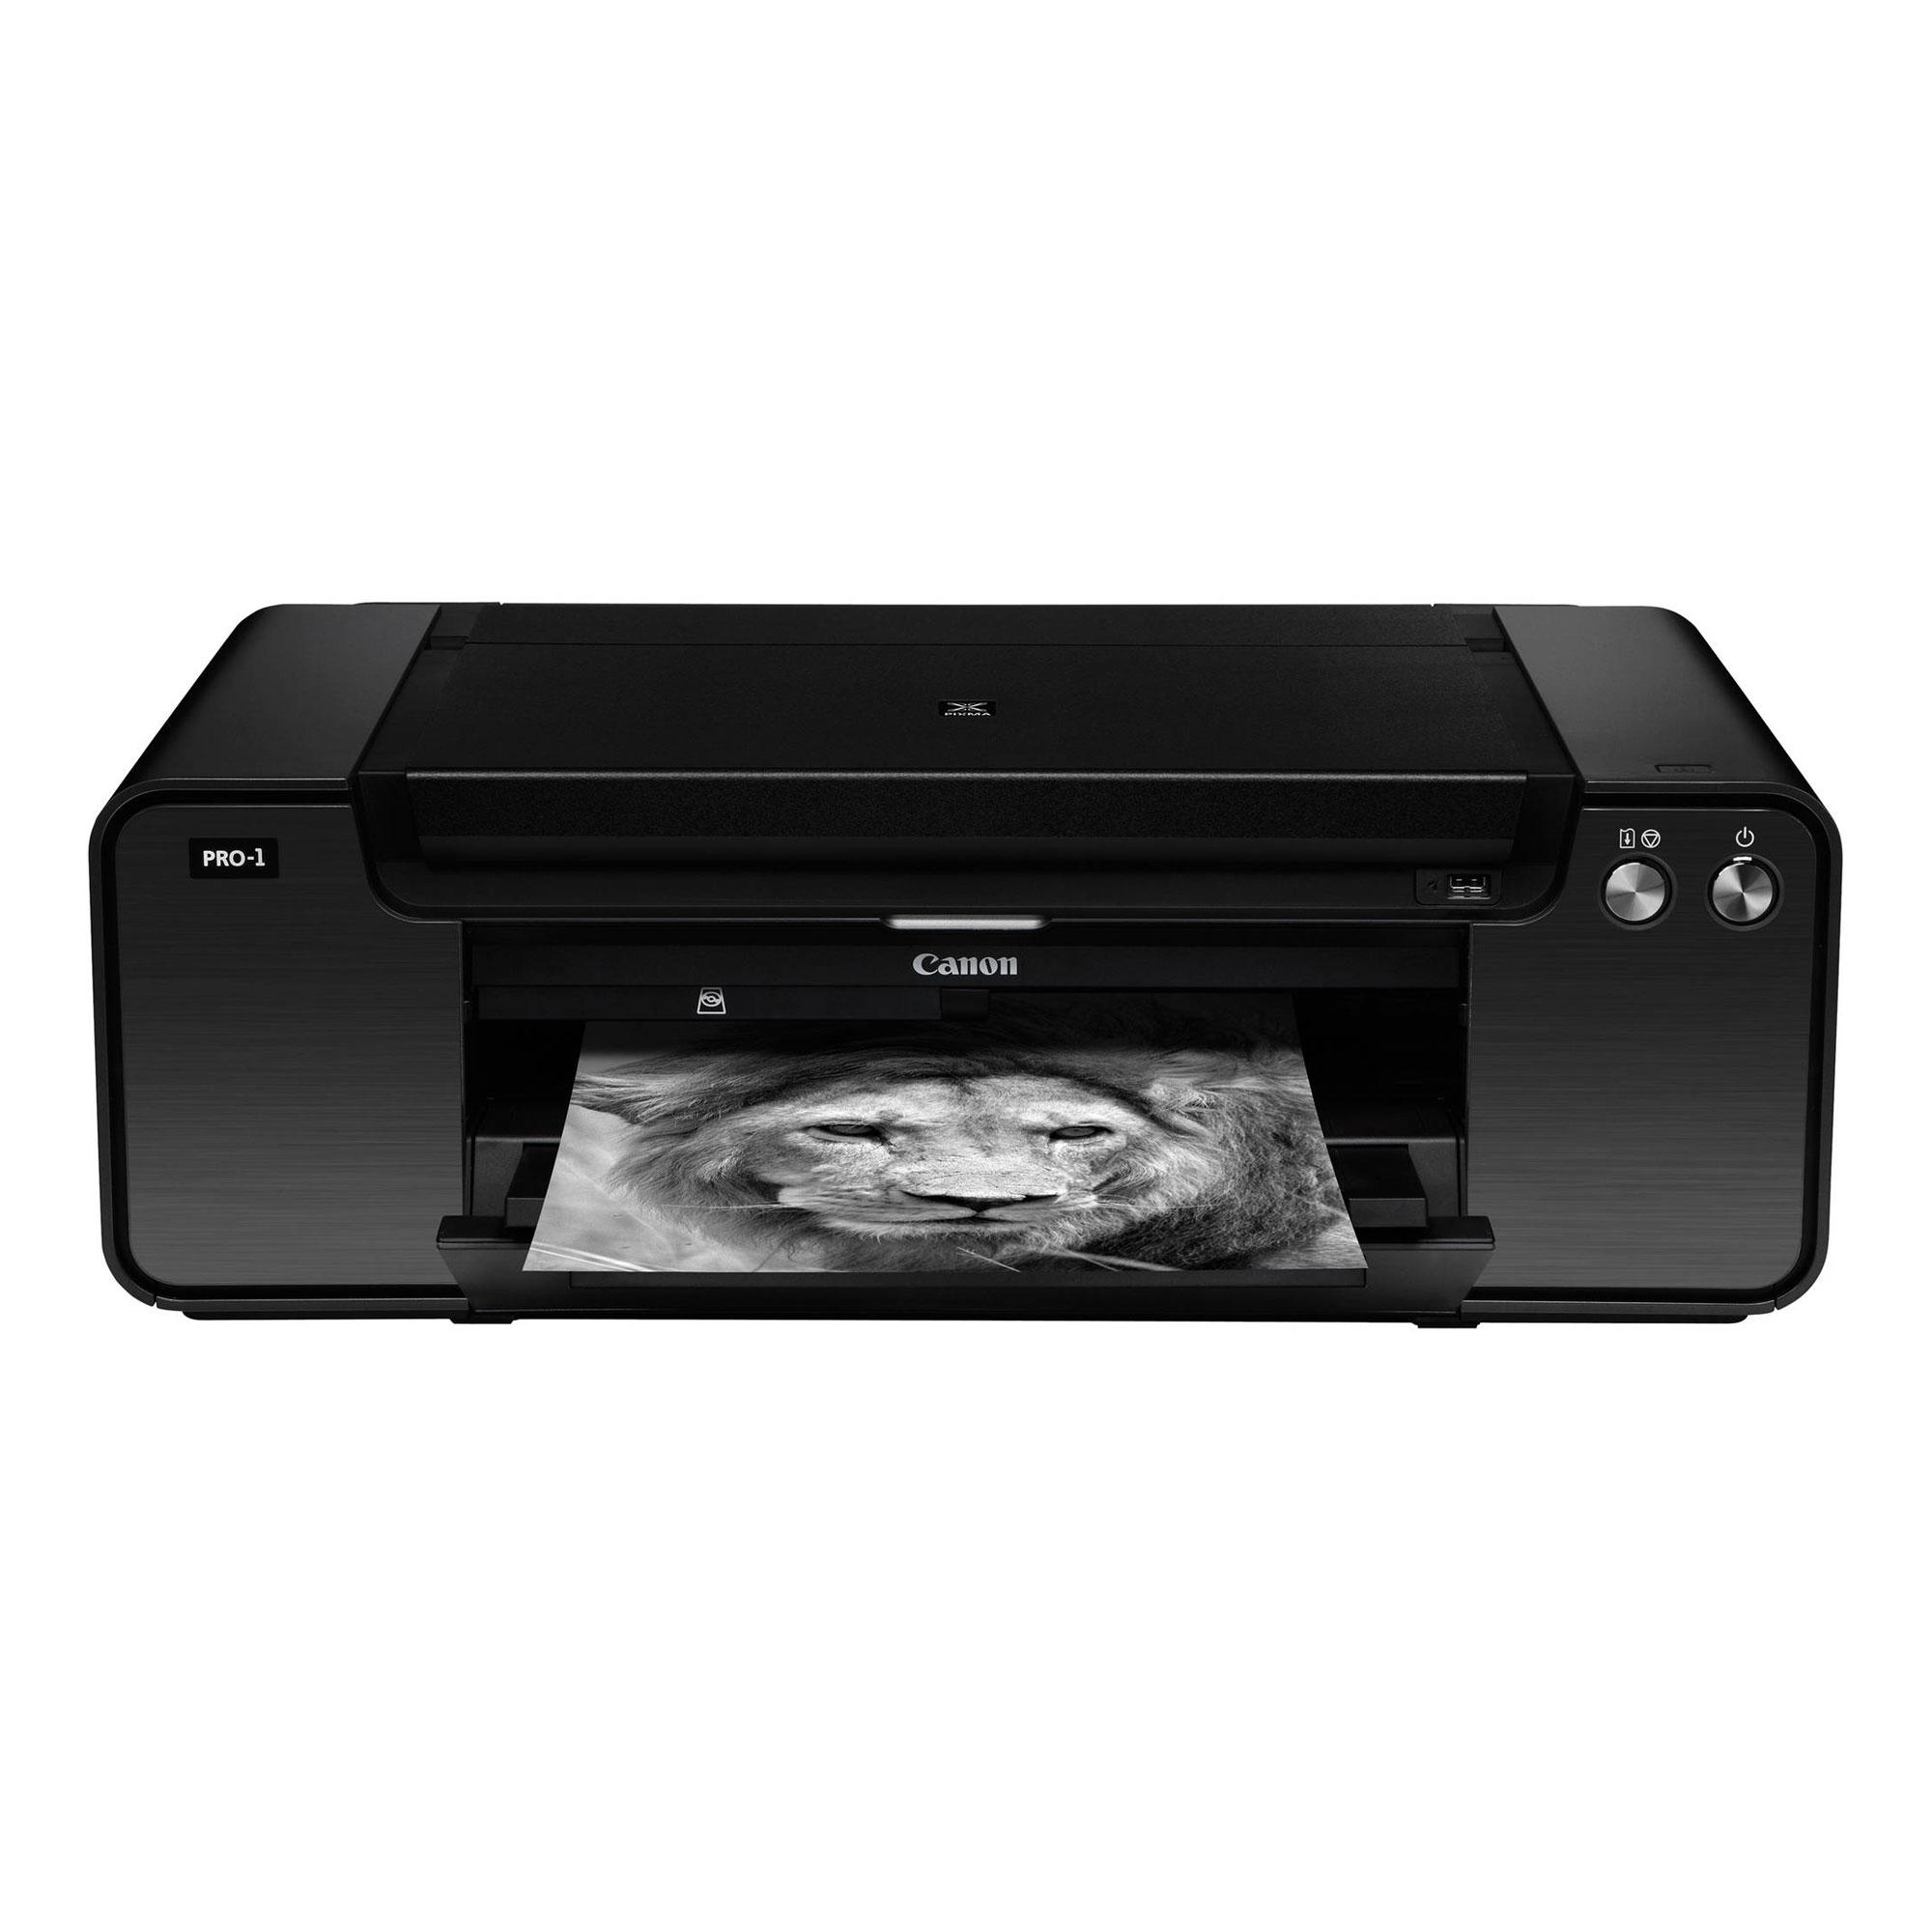 Canon Pixma Pro 1 Photo Printer 4786b002 Ink Cartridge Pgi 29 Red